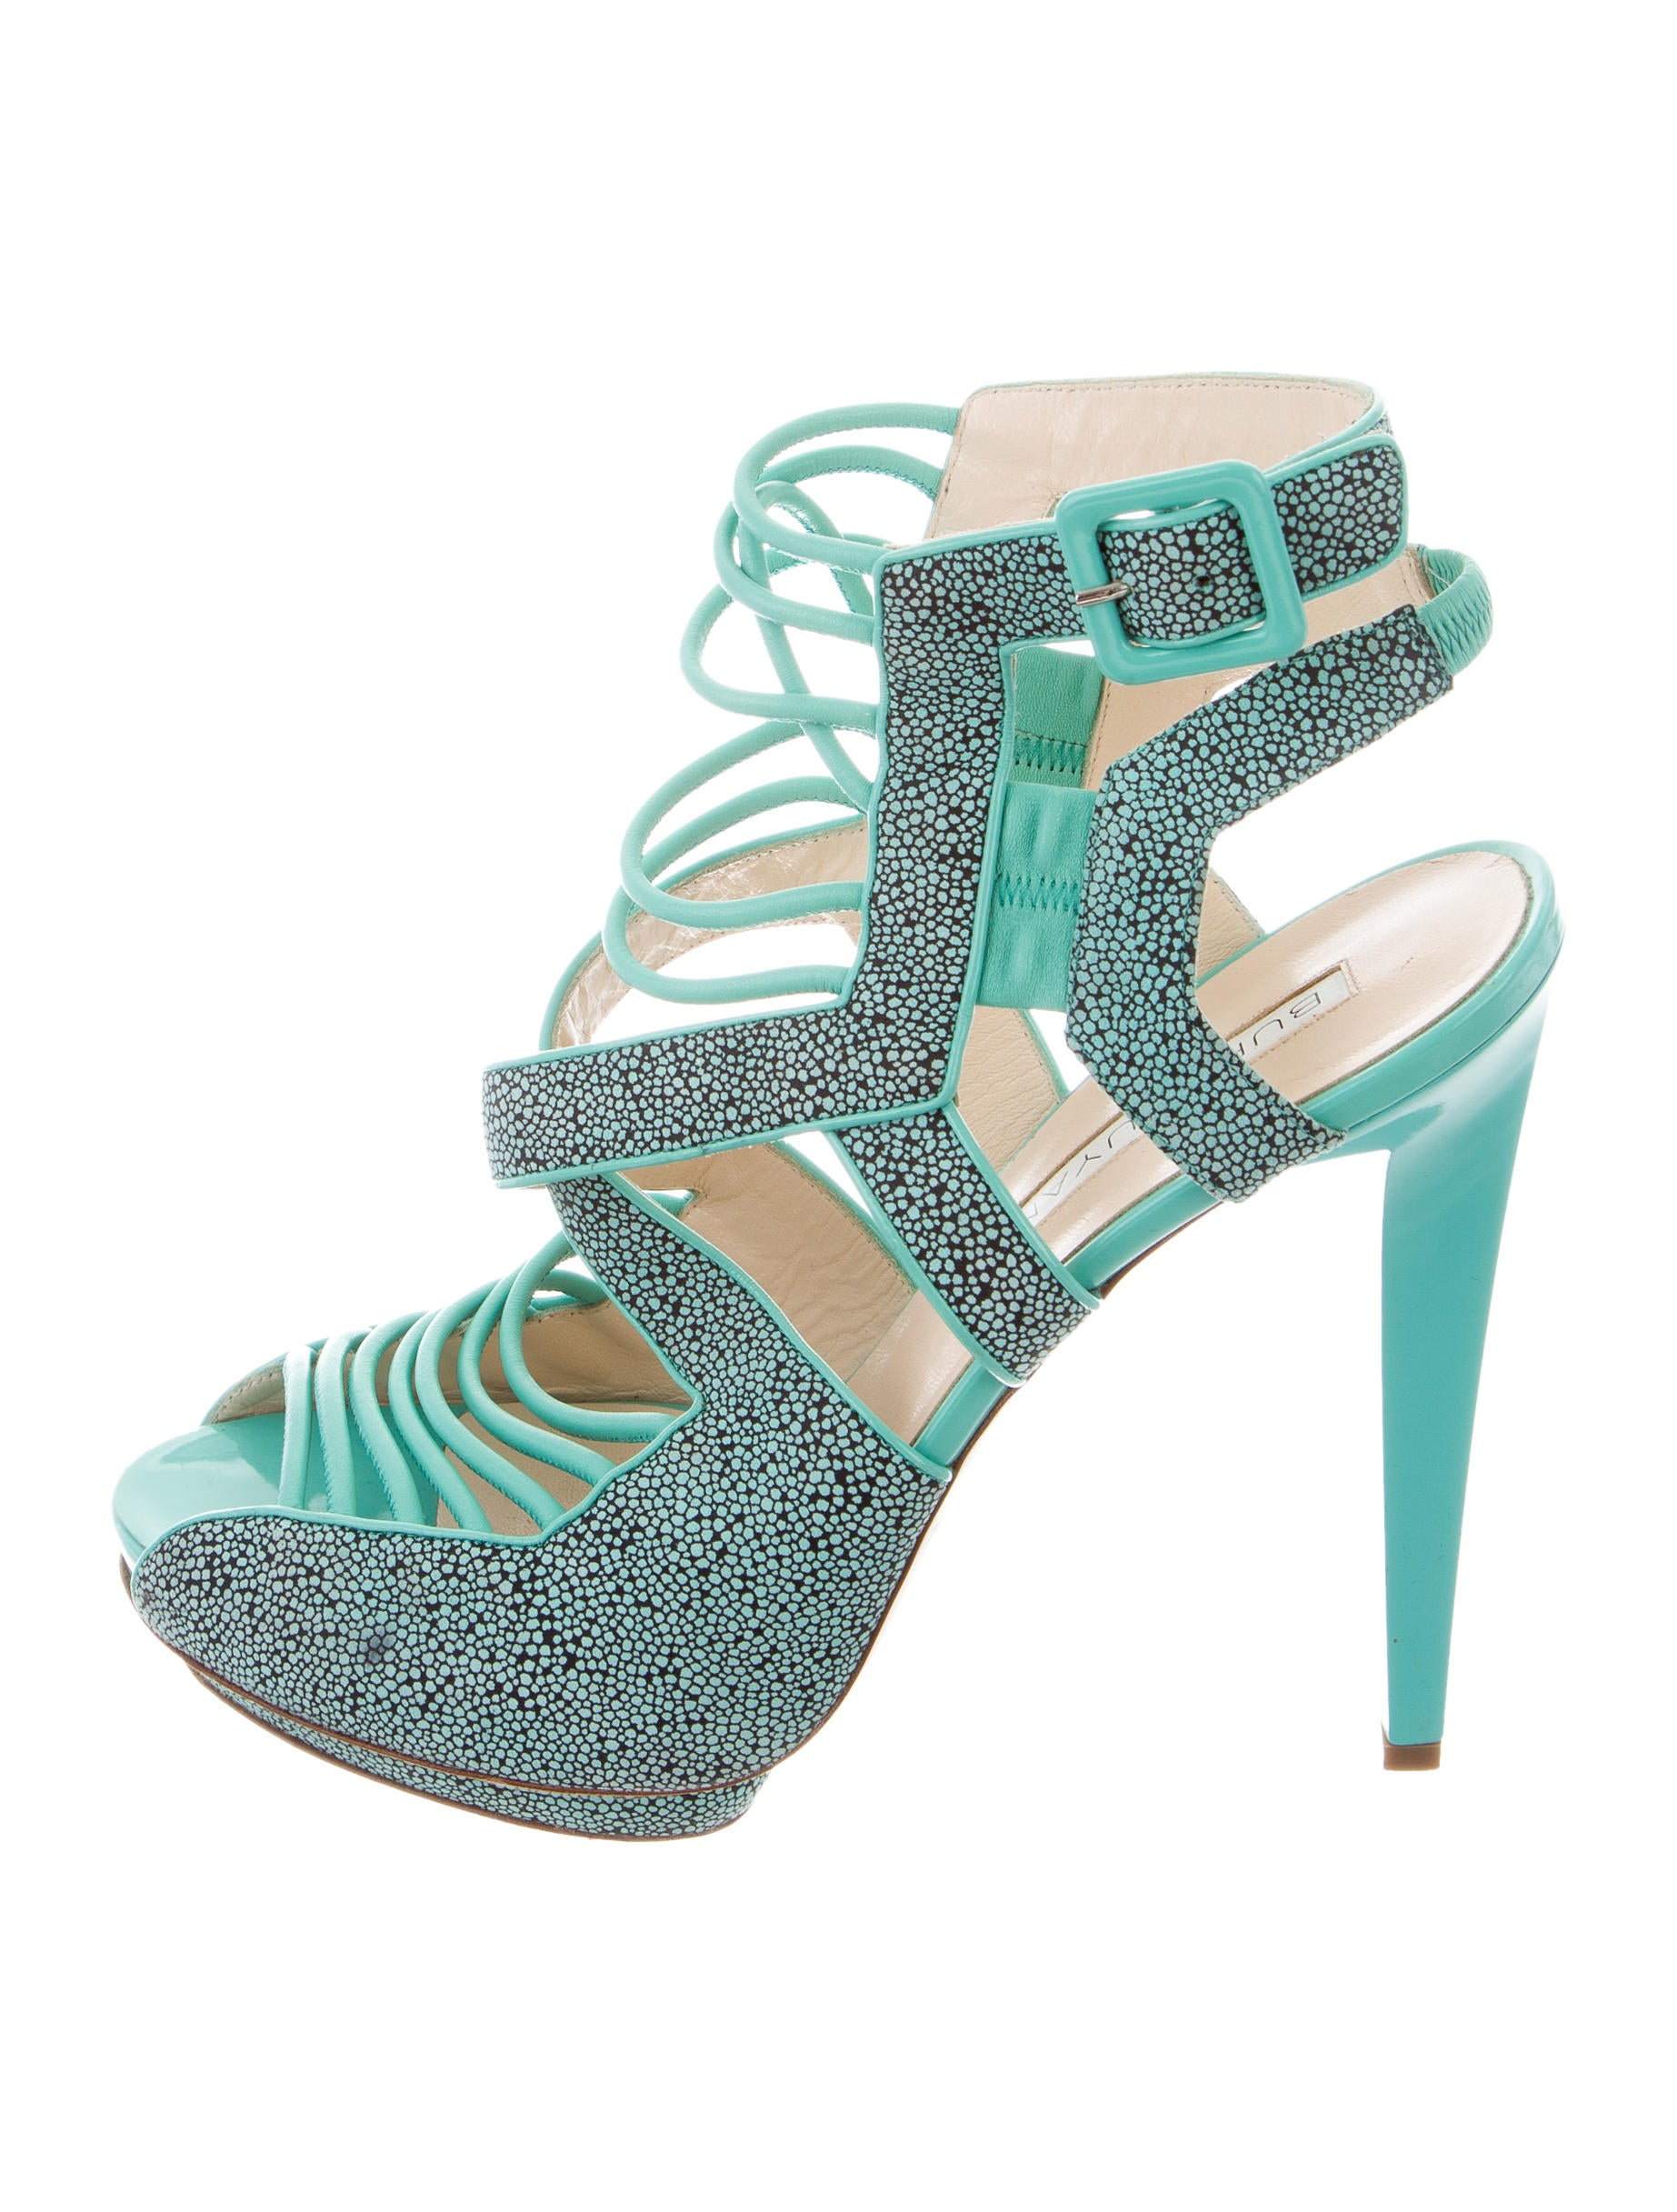 Burak Uyan Printed Multistrap Sandals new styles Cheapest sale online best deals outlet 100% original SoAPp